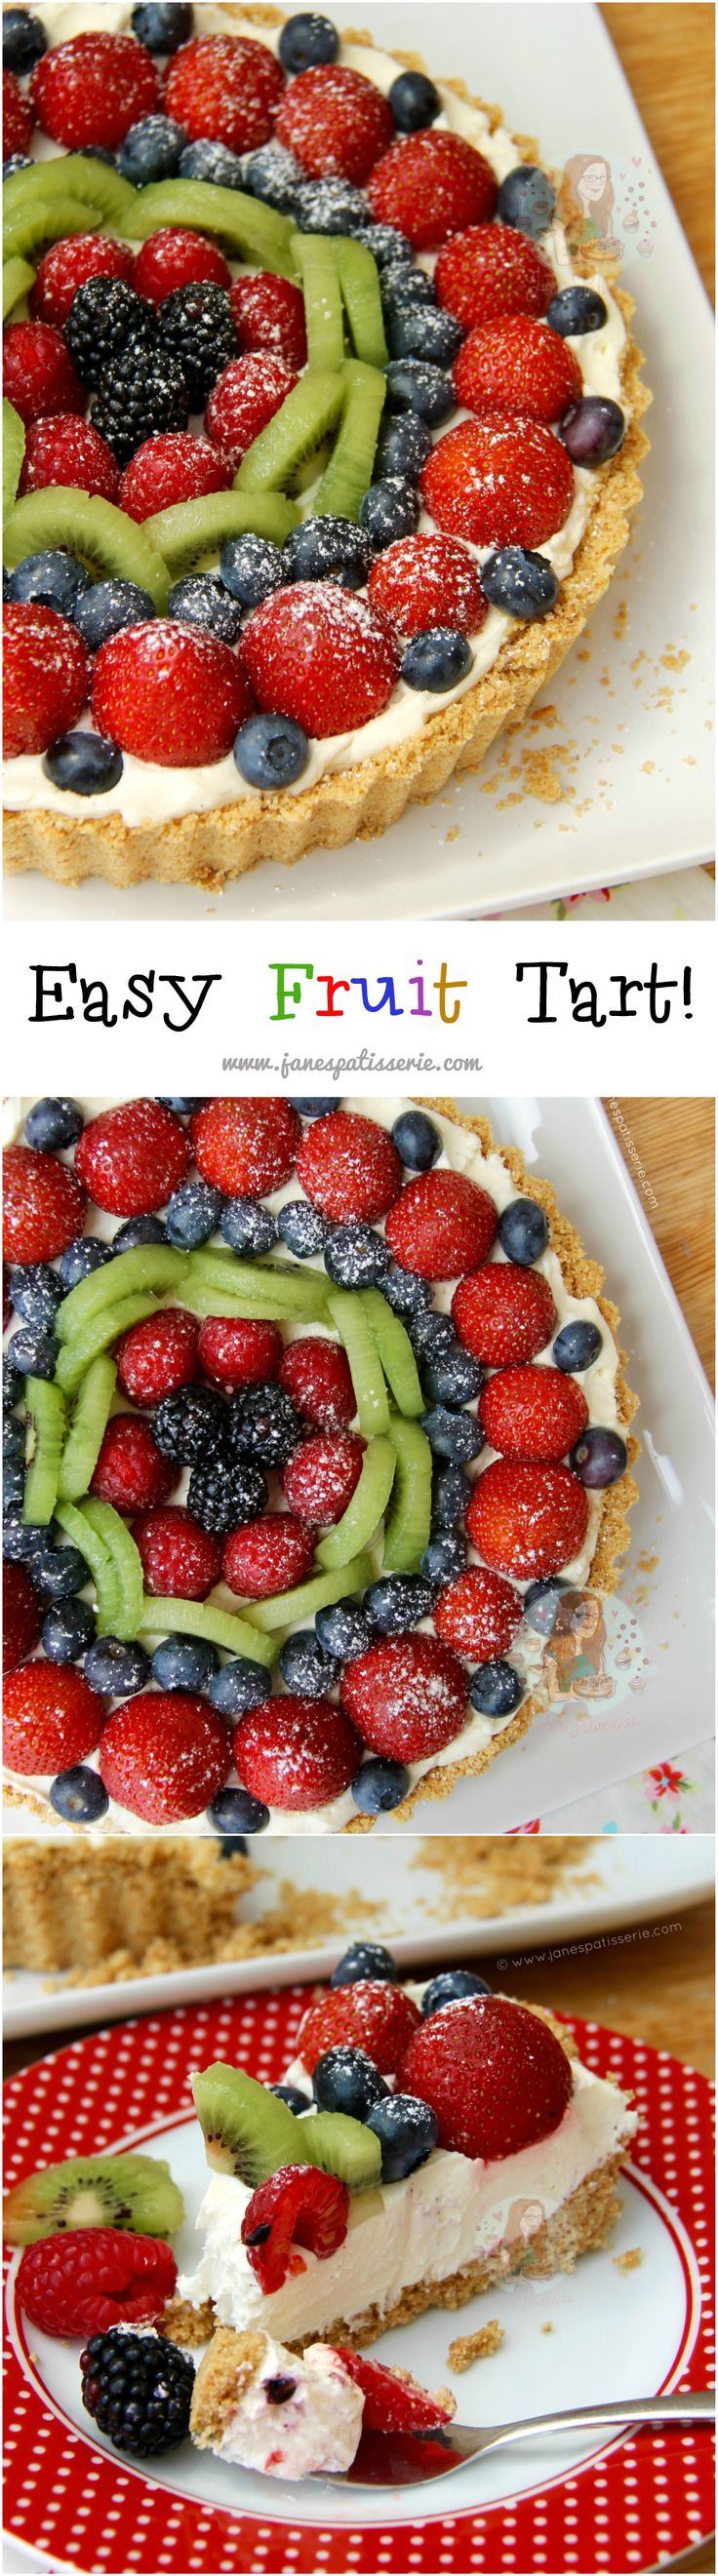 healthy fruit based desserts fruit tart recipe